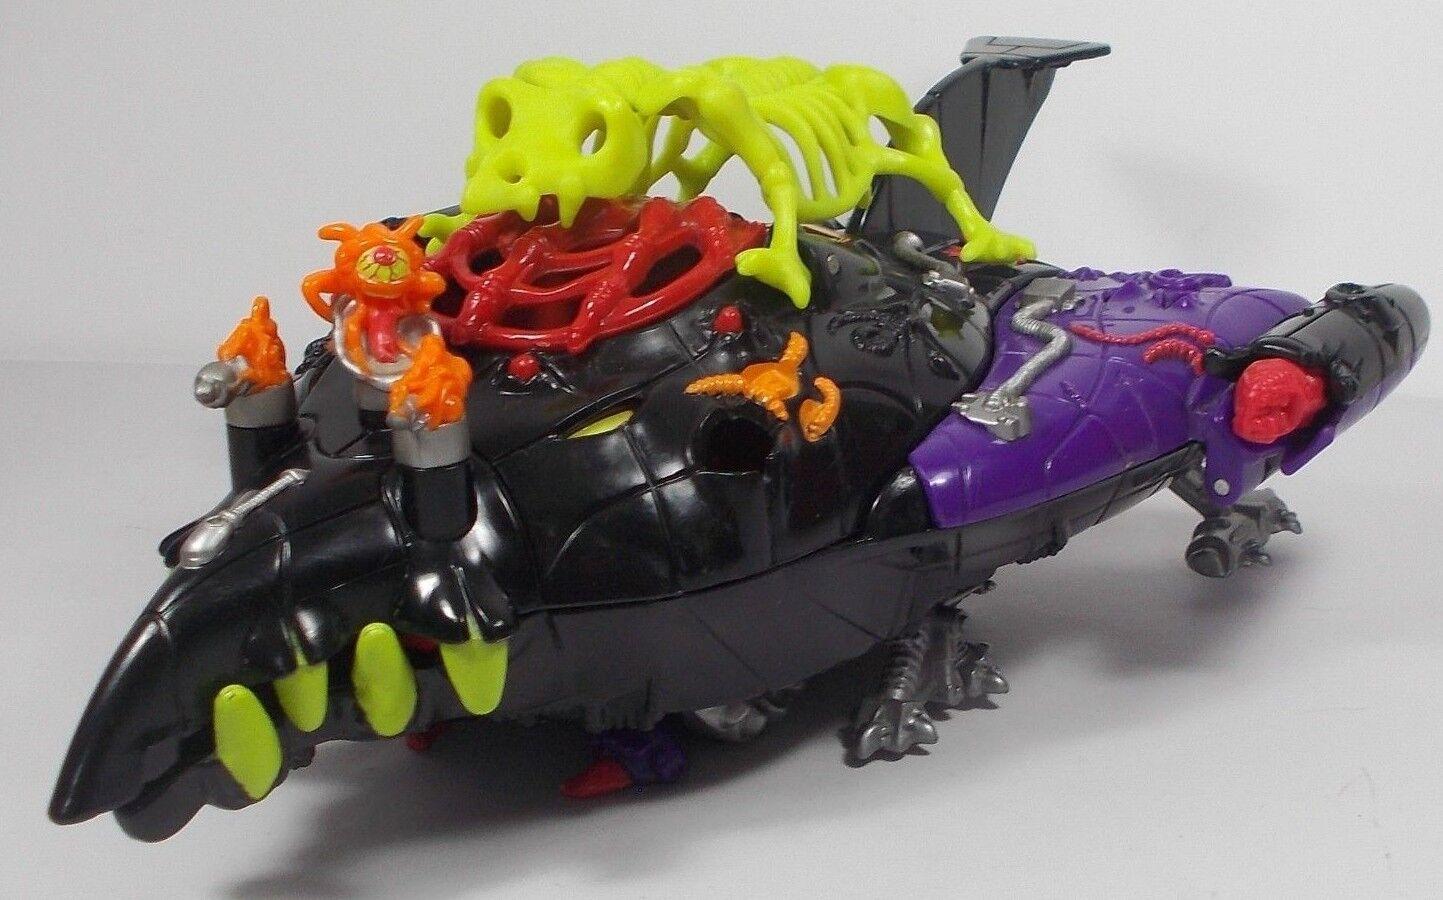 Mighty Max --- Dread Star --- Terror Talons --- Complete Playset - blueebird Toys